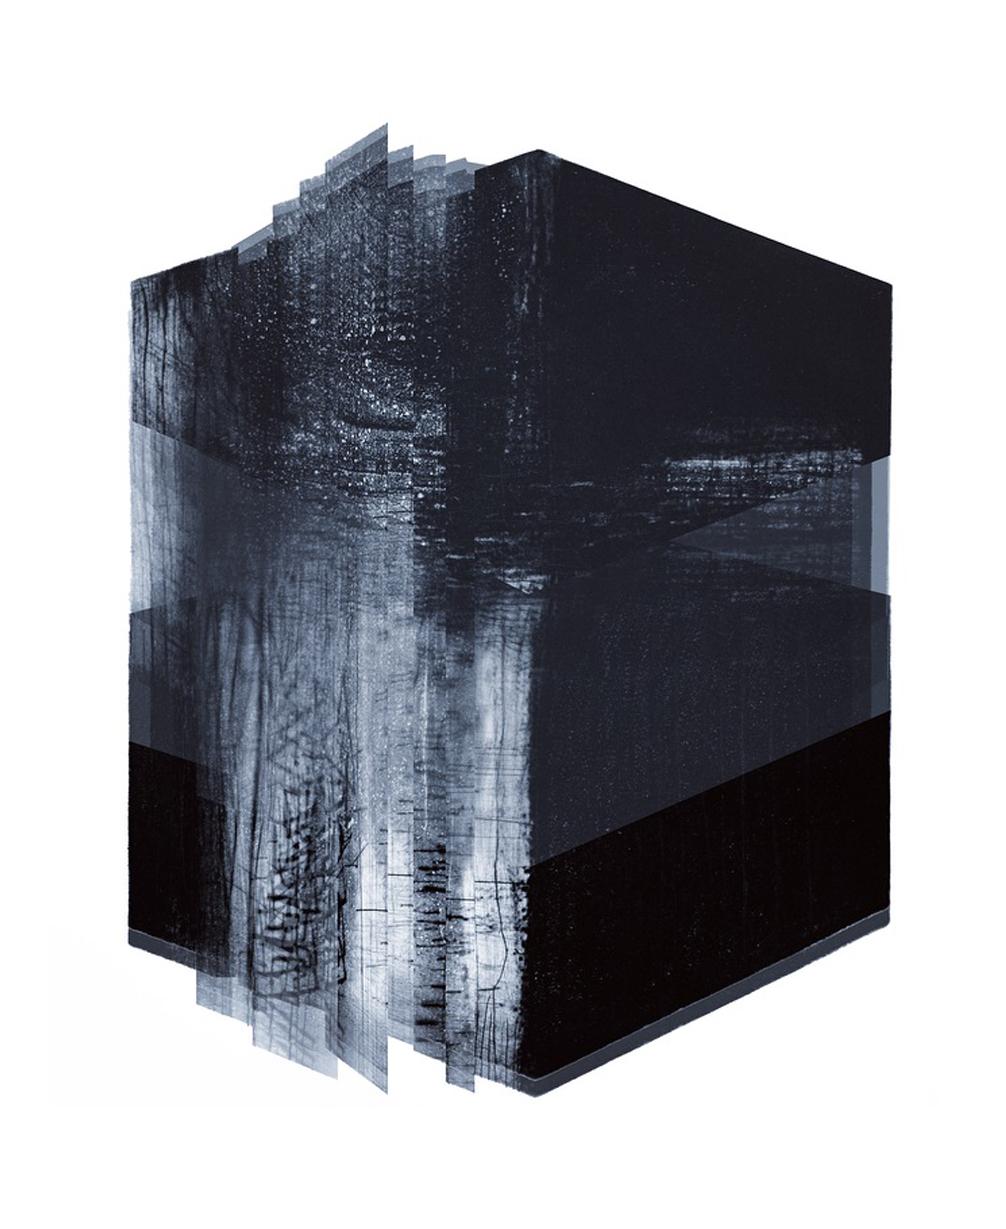 Infinite cube III